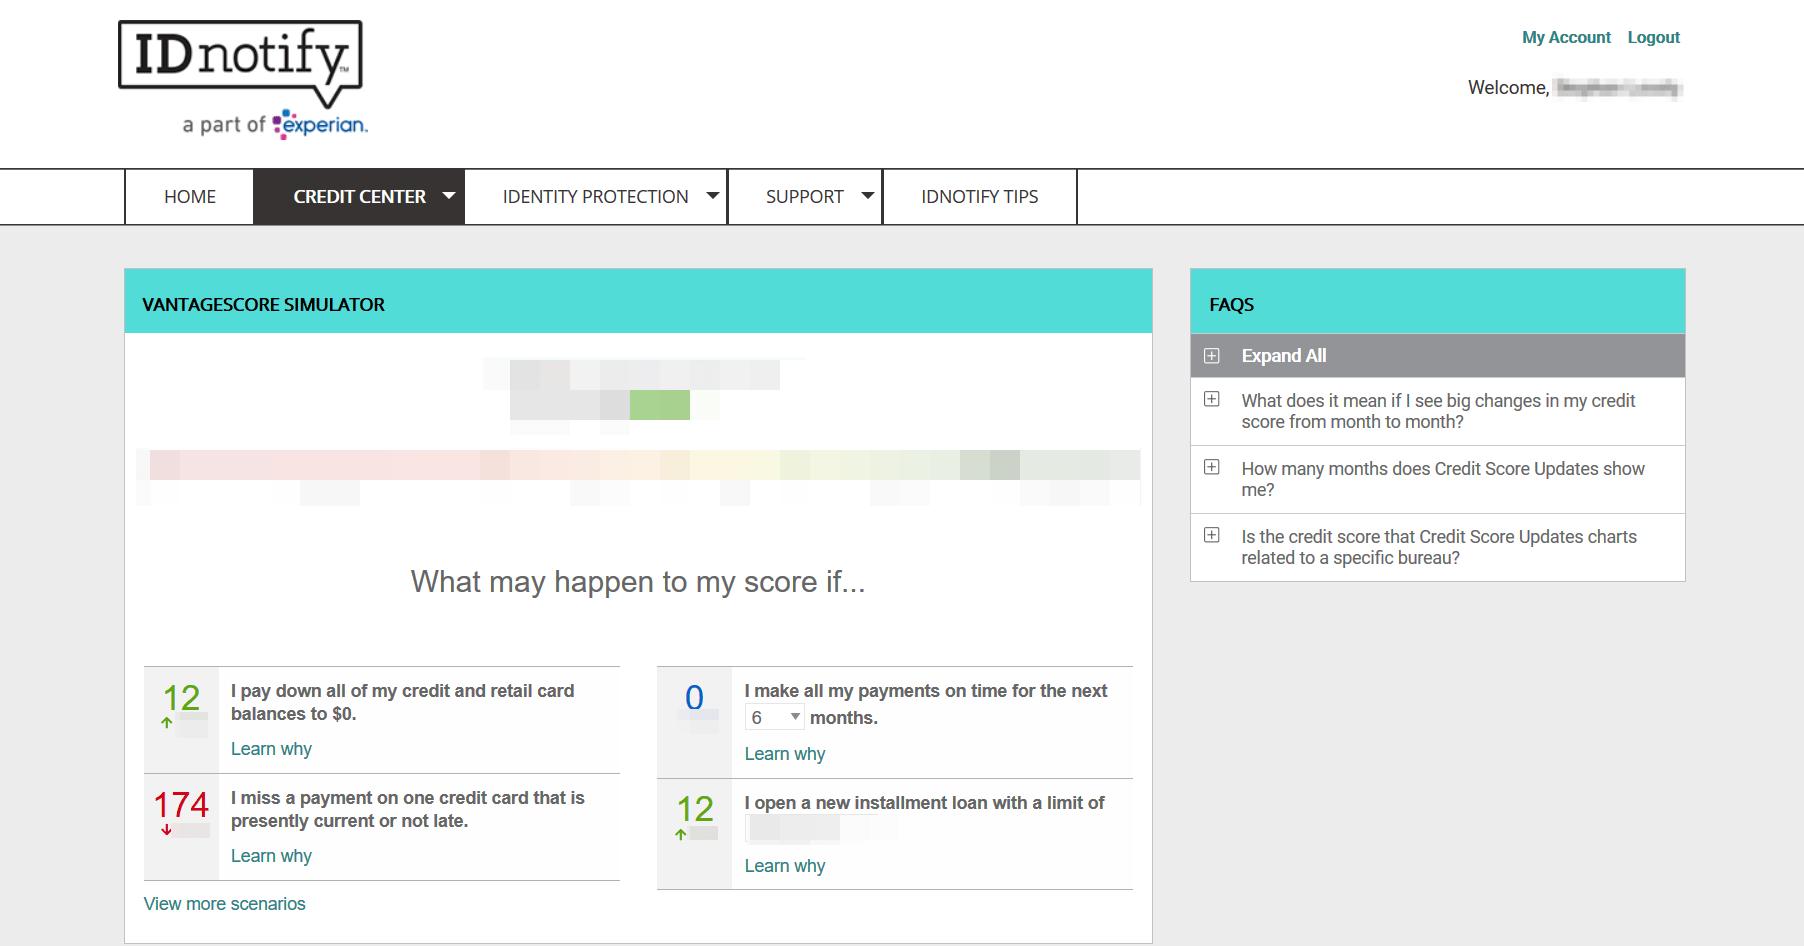 IDnotify - Credit Changes